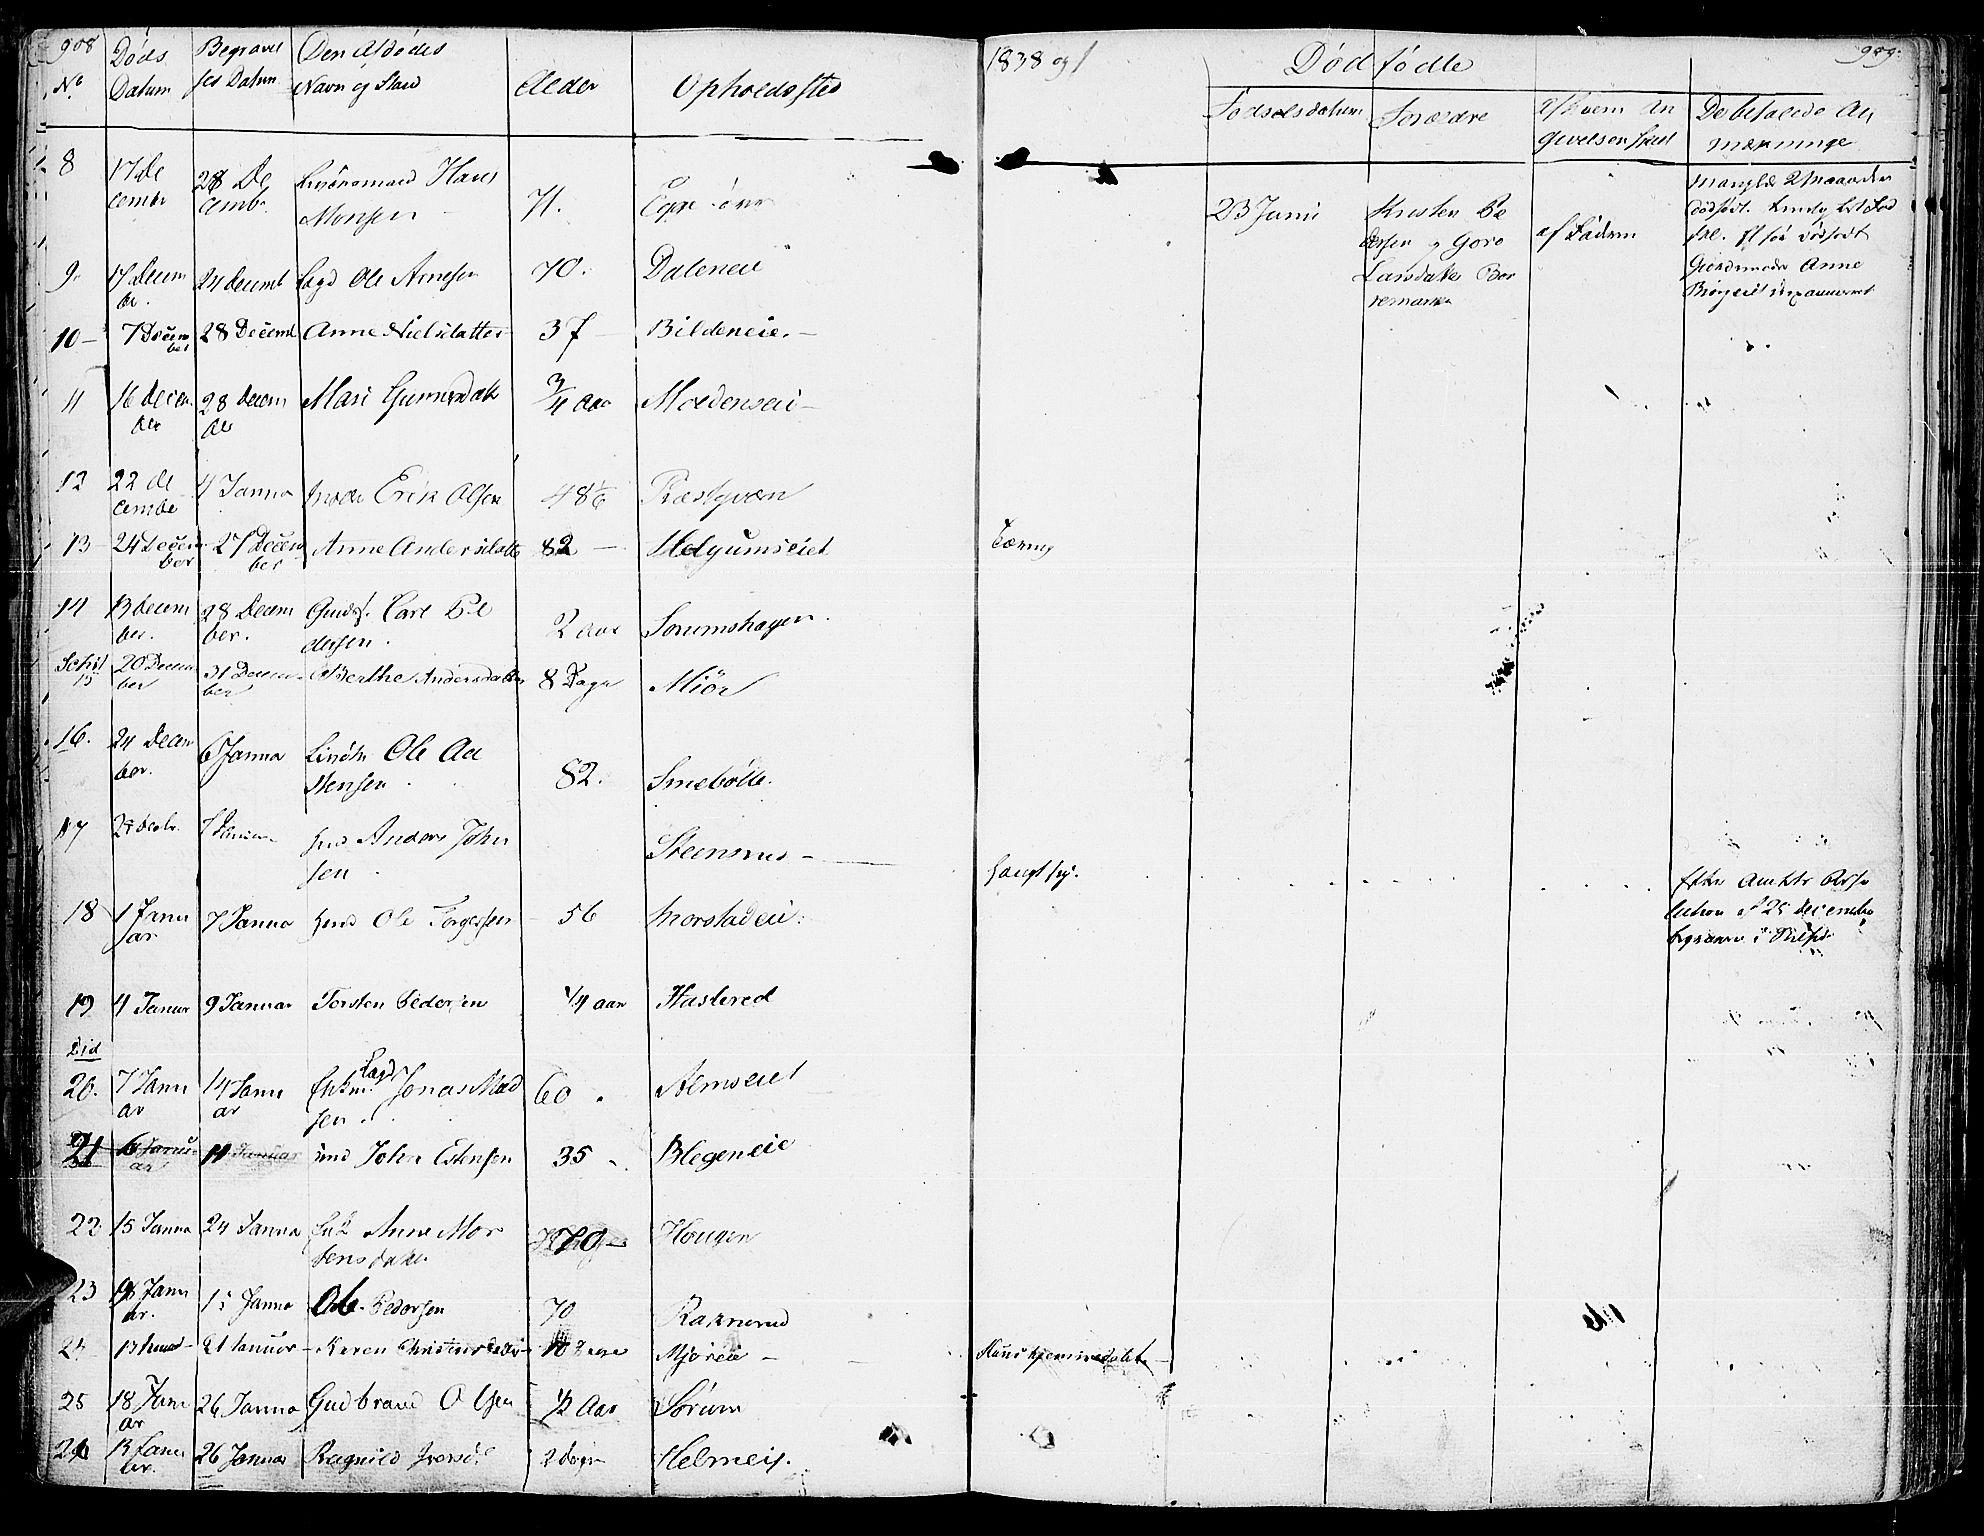 SAH, Gran prestekontor, Ministerialbok nr. 10, 1824-1842, s. 908-909